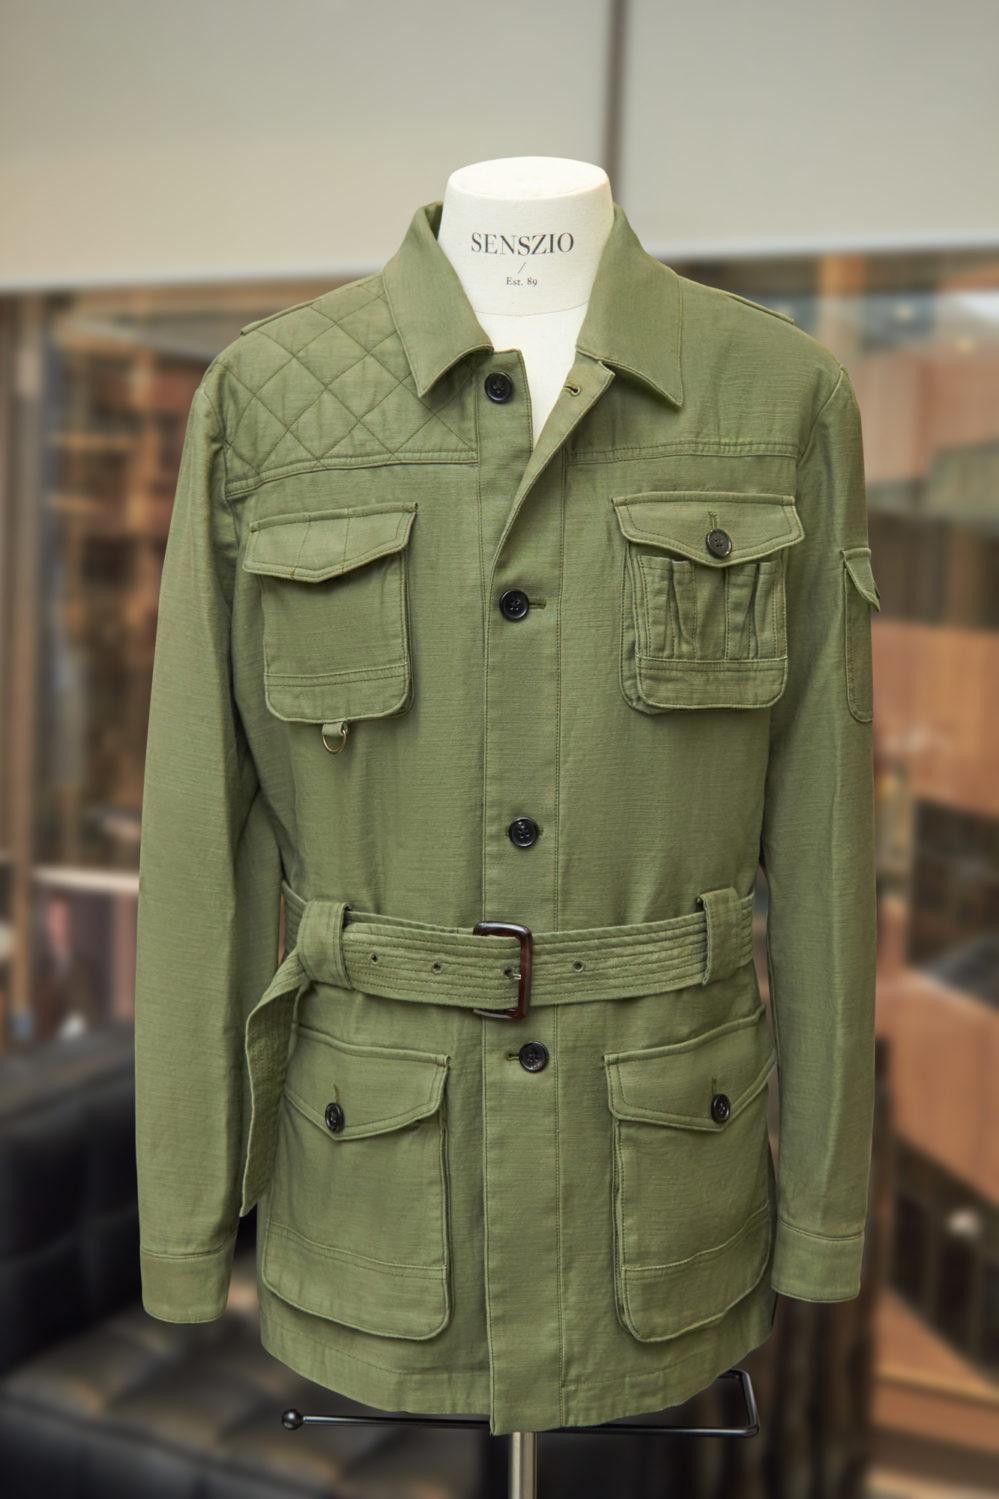 Custom tailored safari jackets, a highly versatile outwear garment, part of Senszio's men's casualwear range